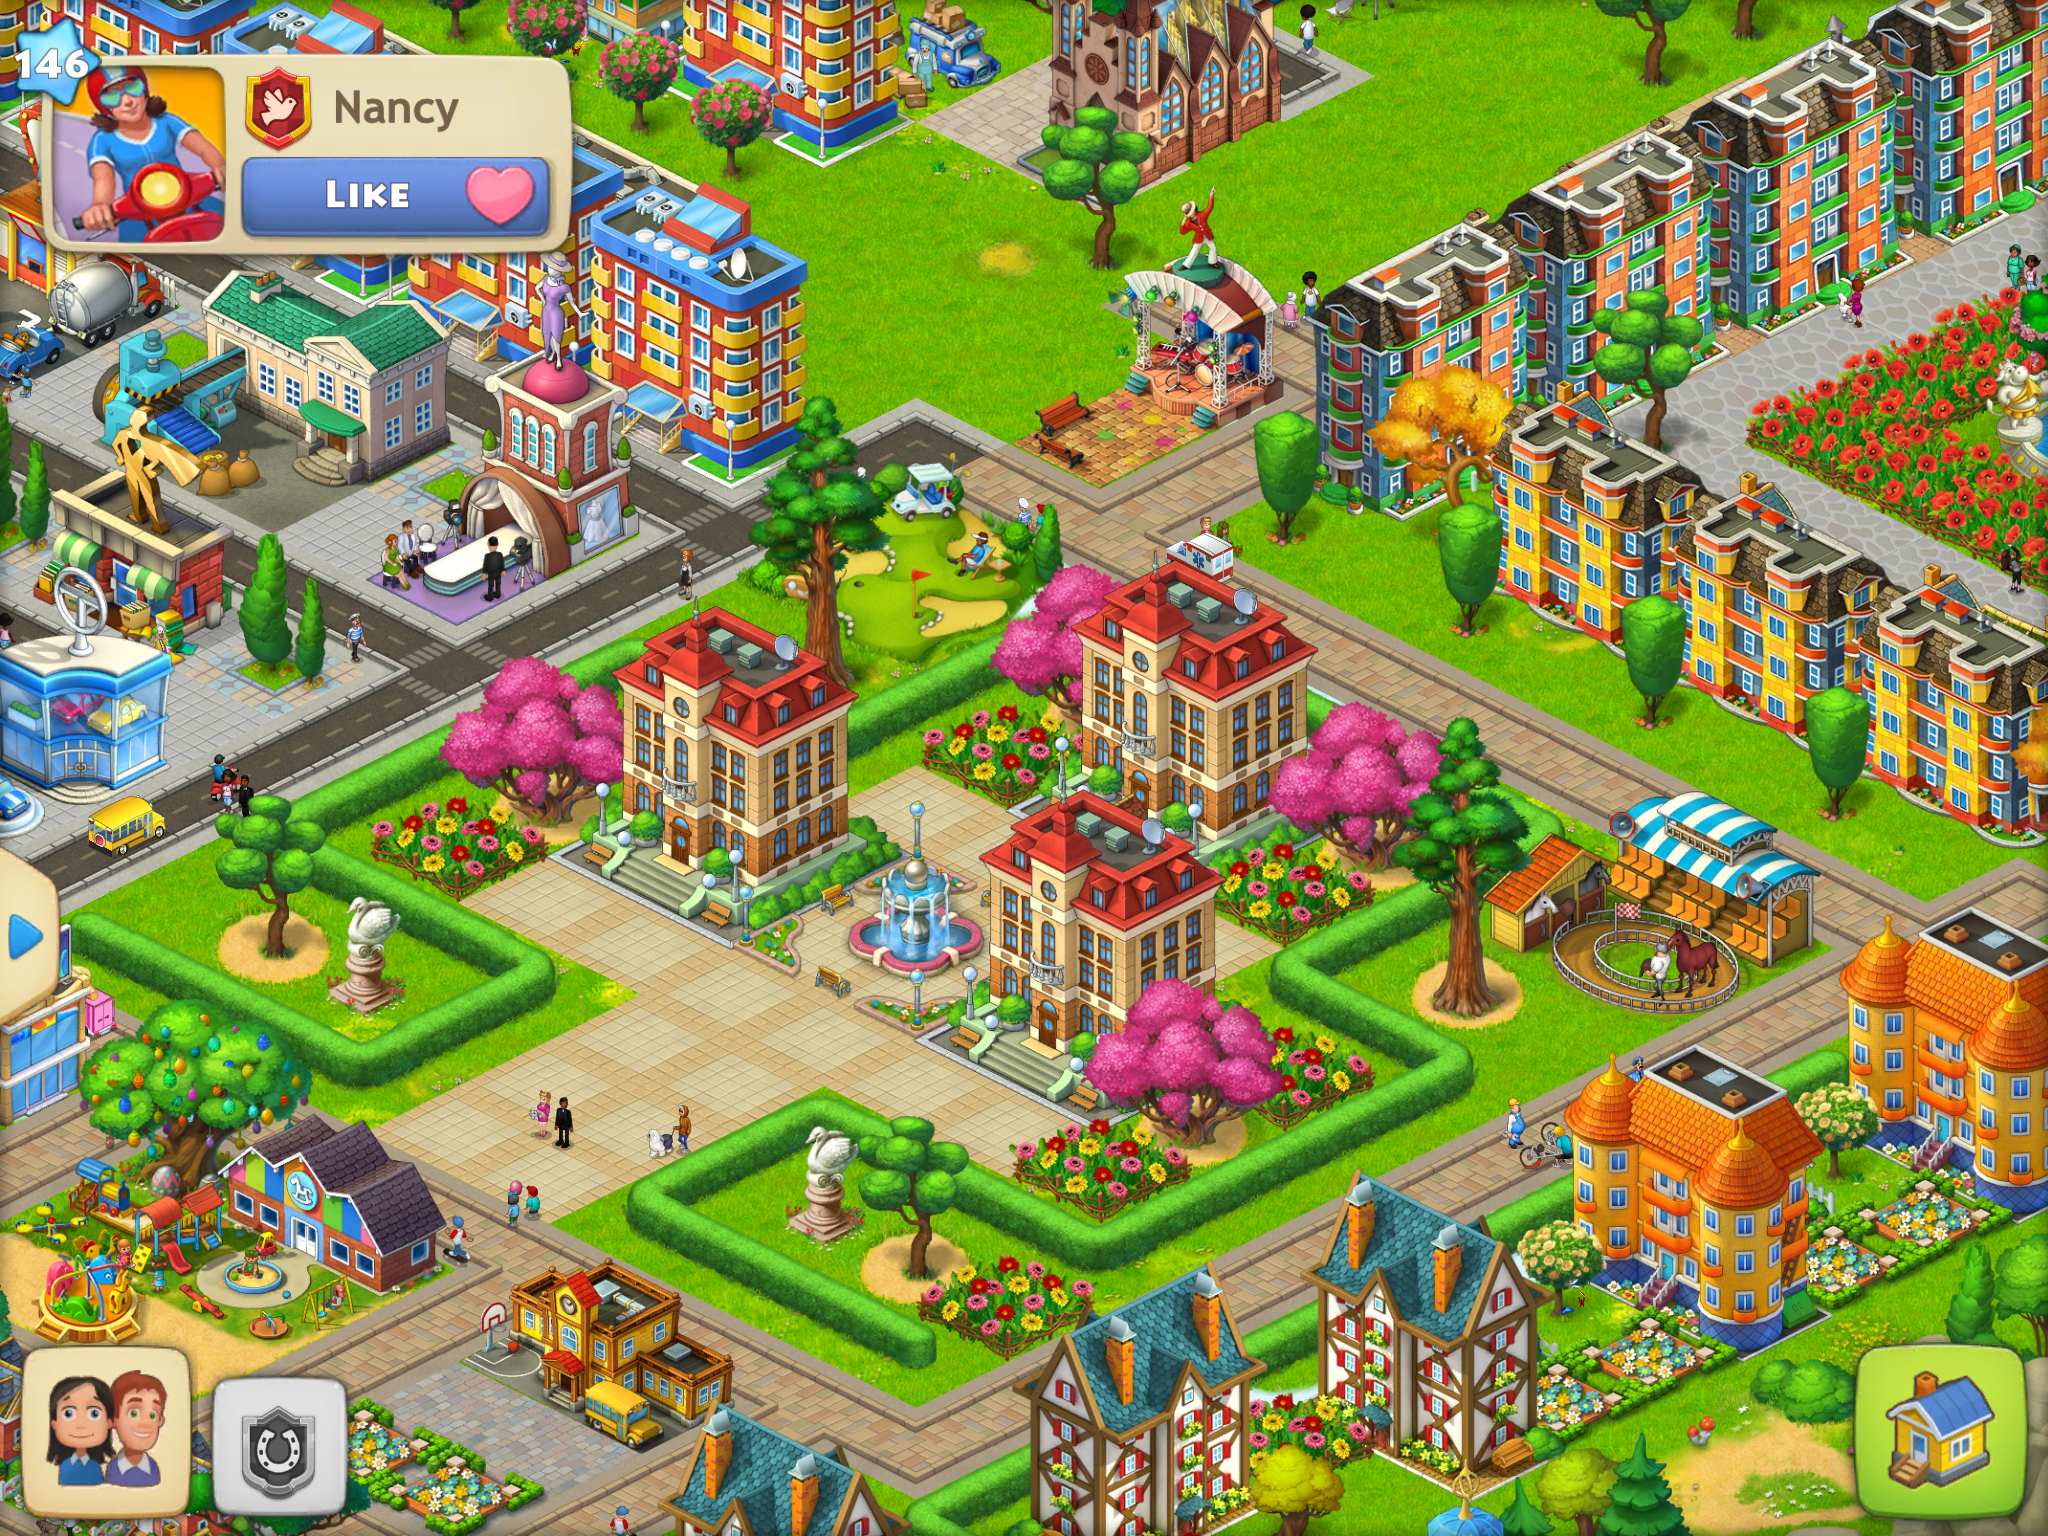 Township Layouts Township game layout, Township, Layout